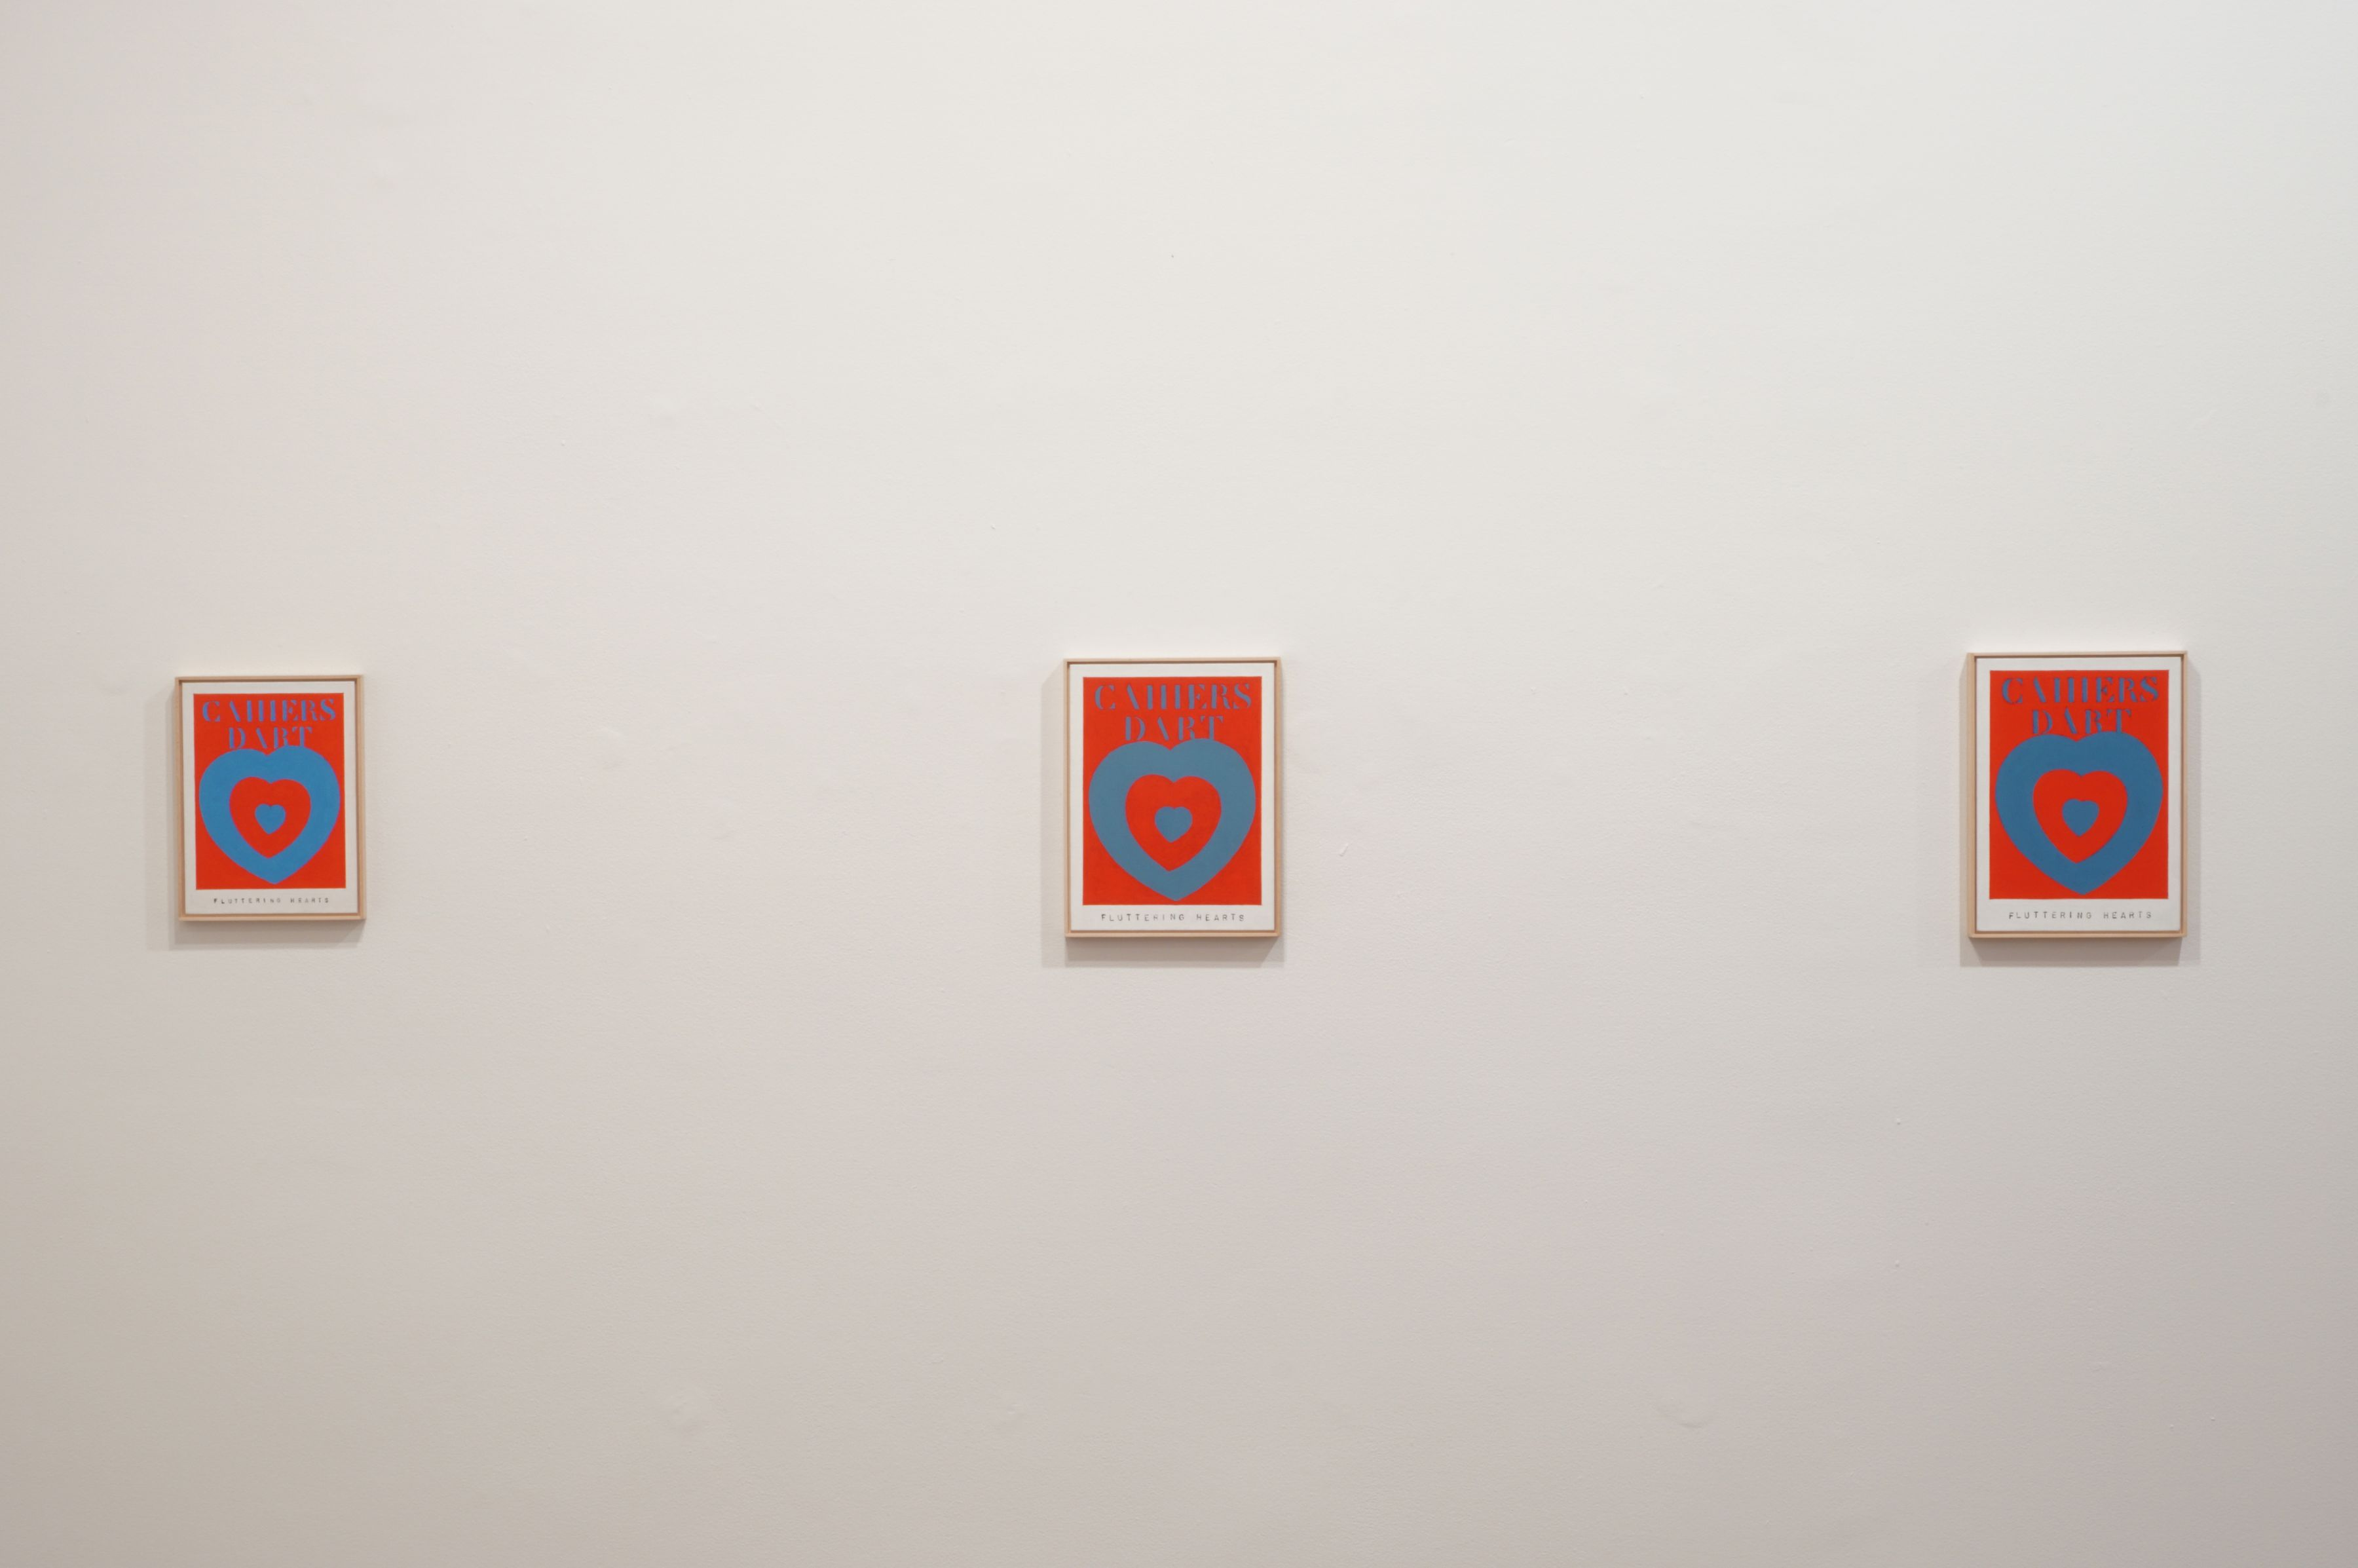 Installation view, Richard Pettibone: Recent Works, 18 EAST 77